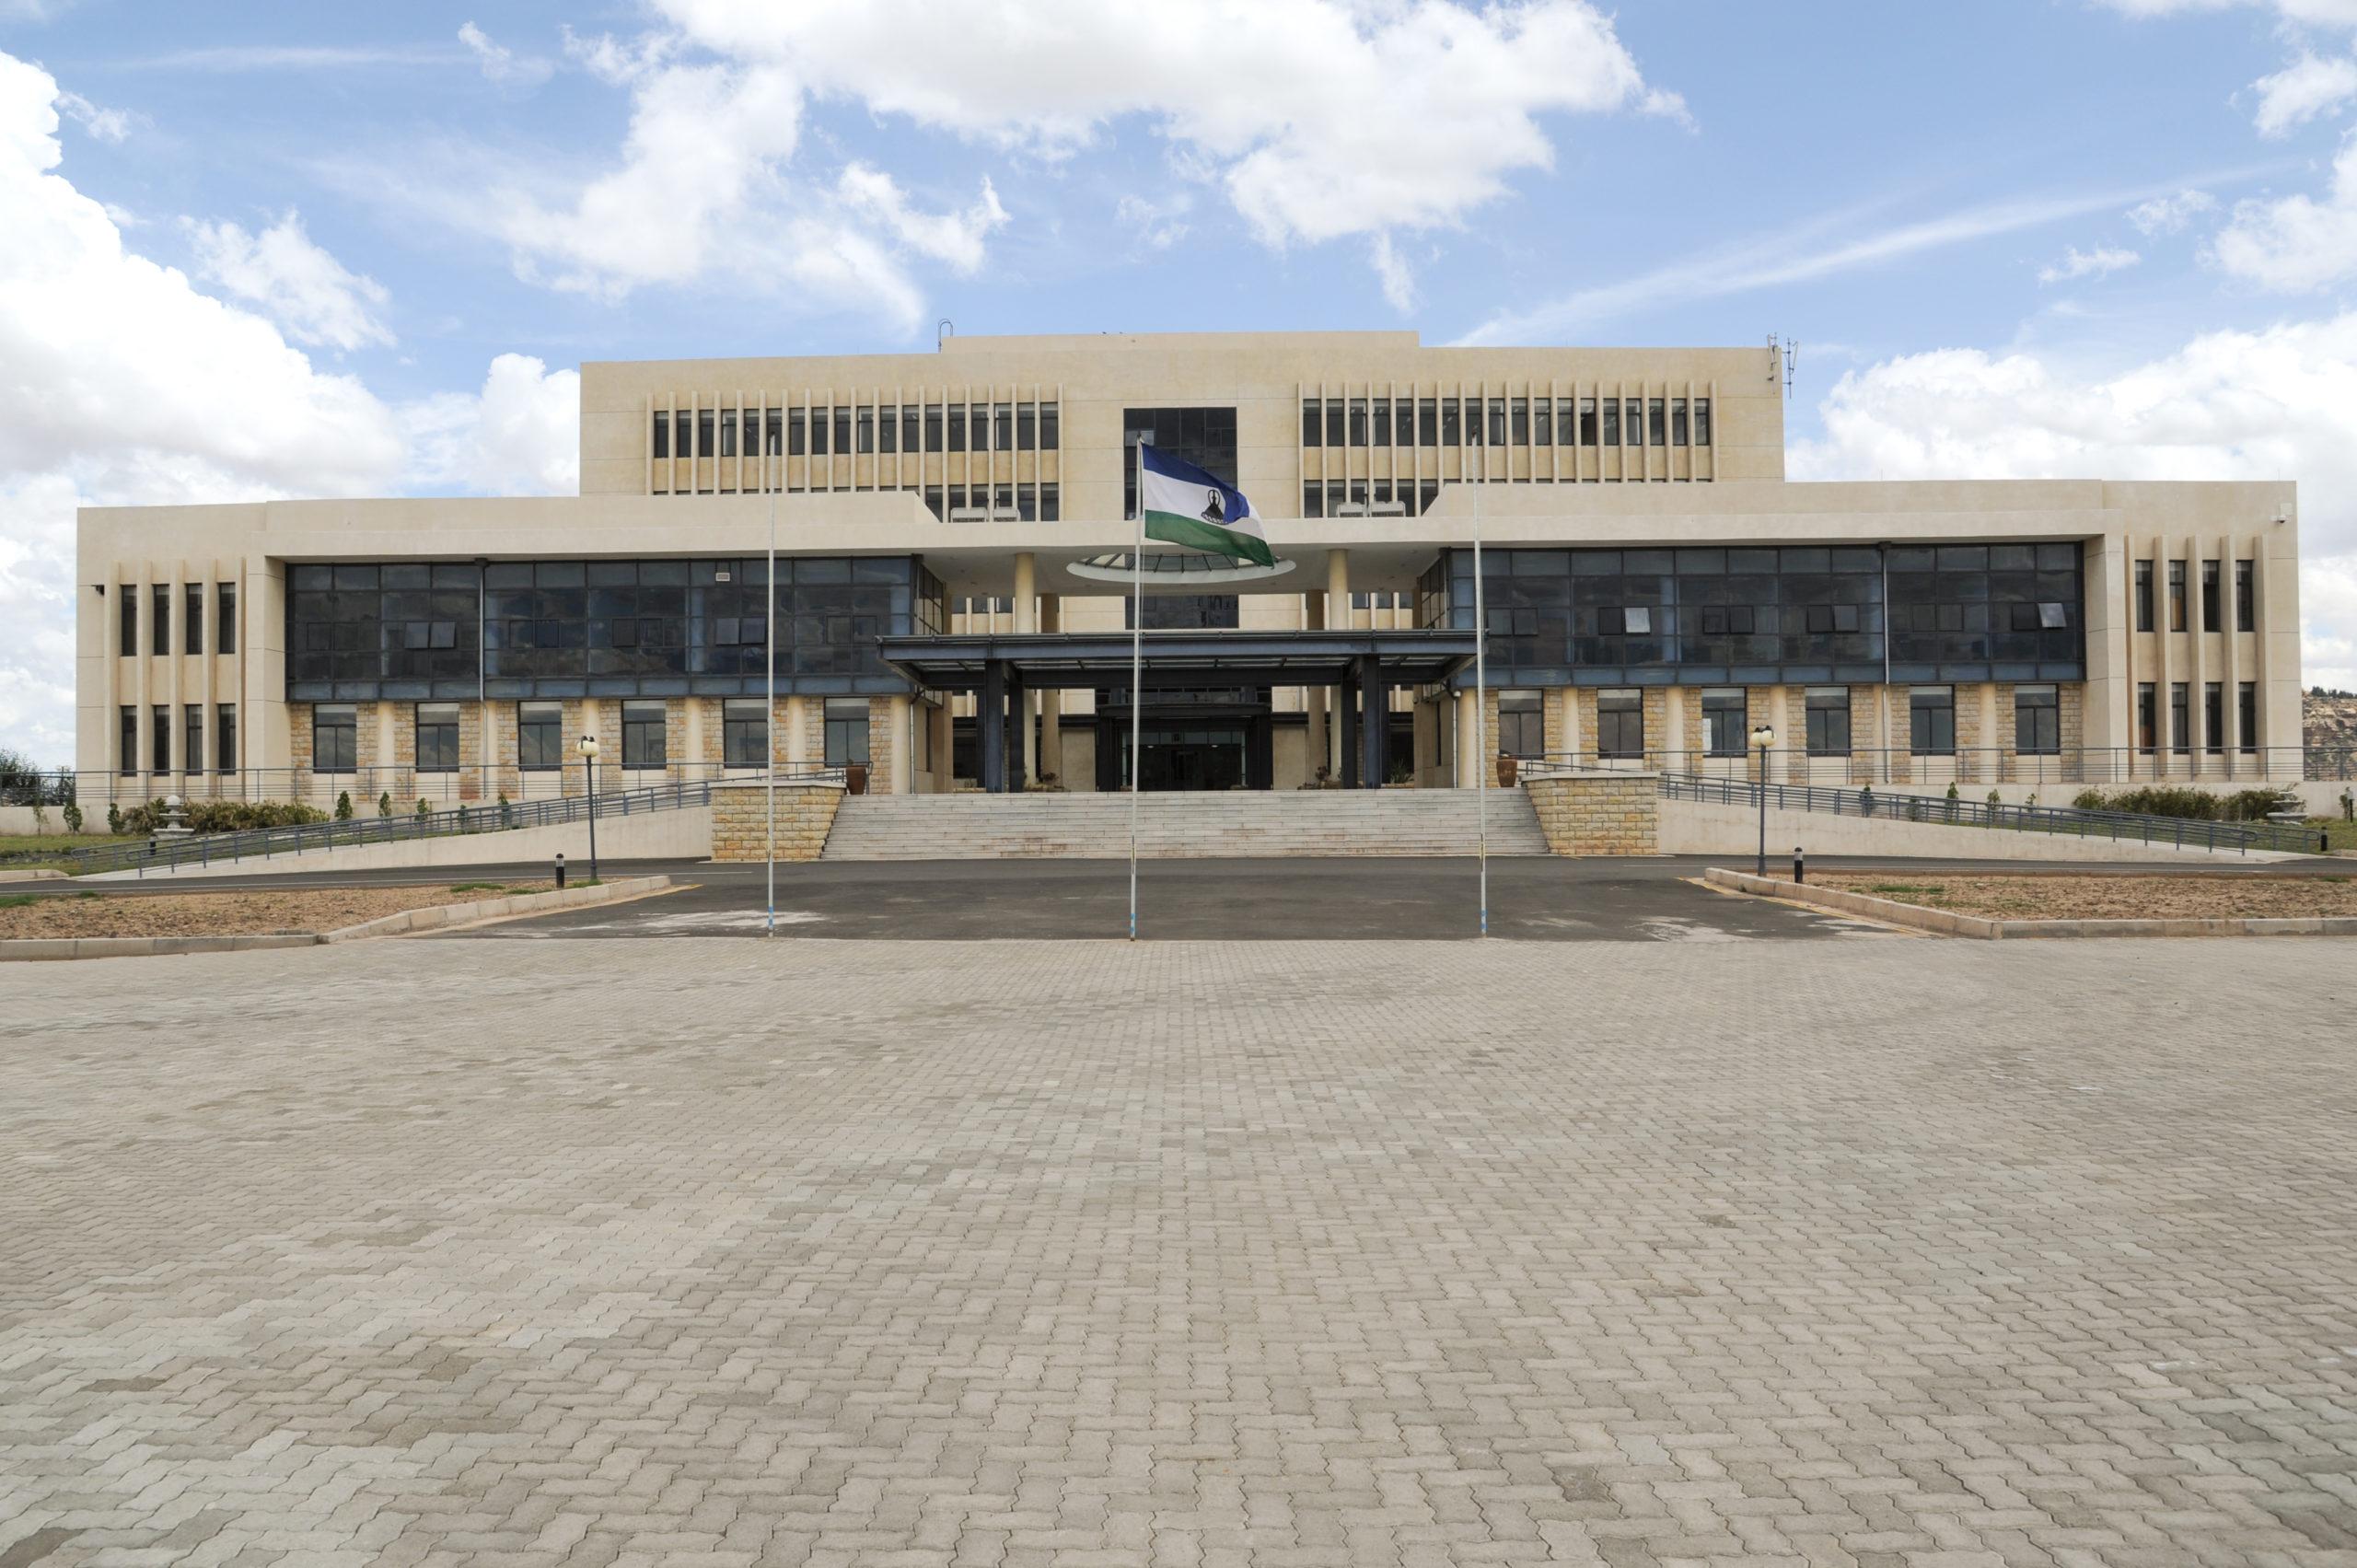 LesothoParliament